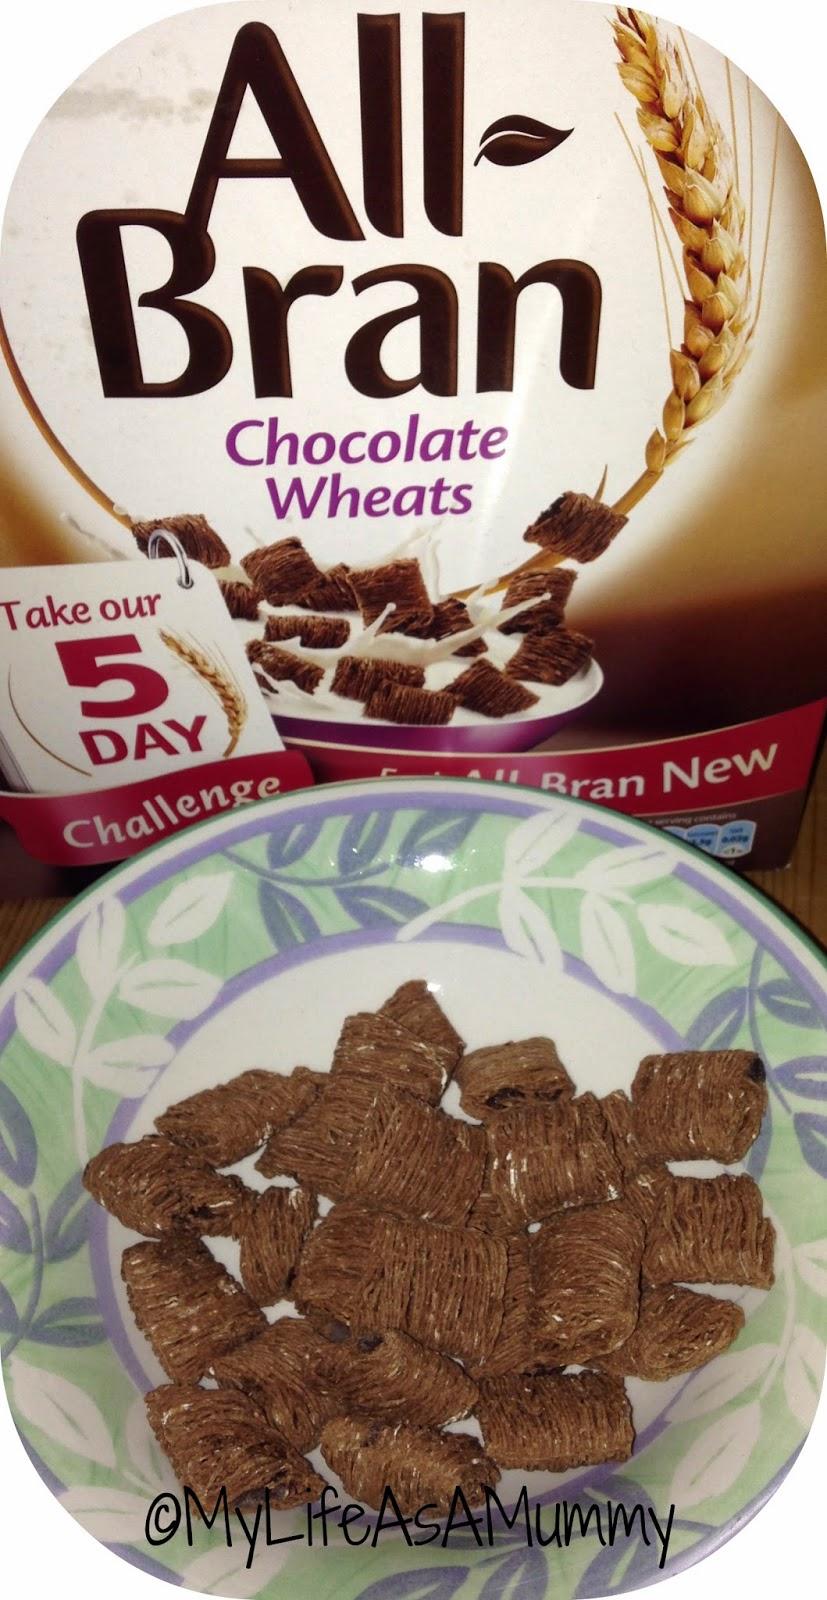 Chocolate Wheats